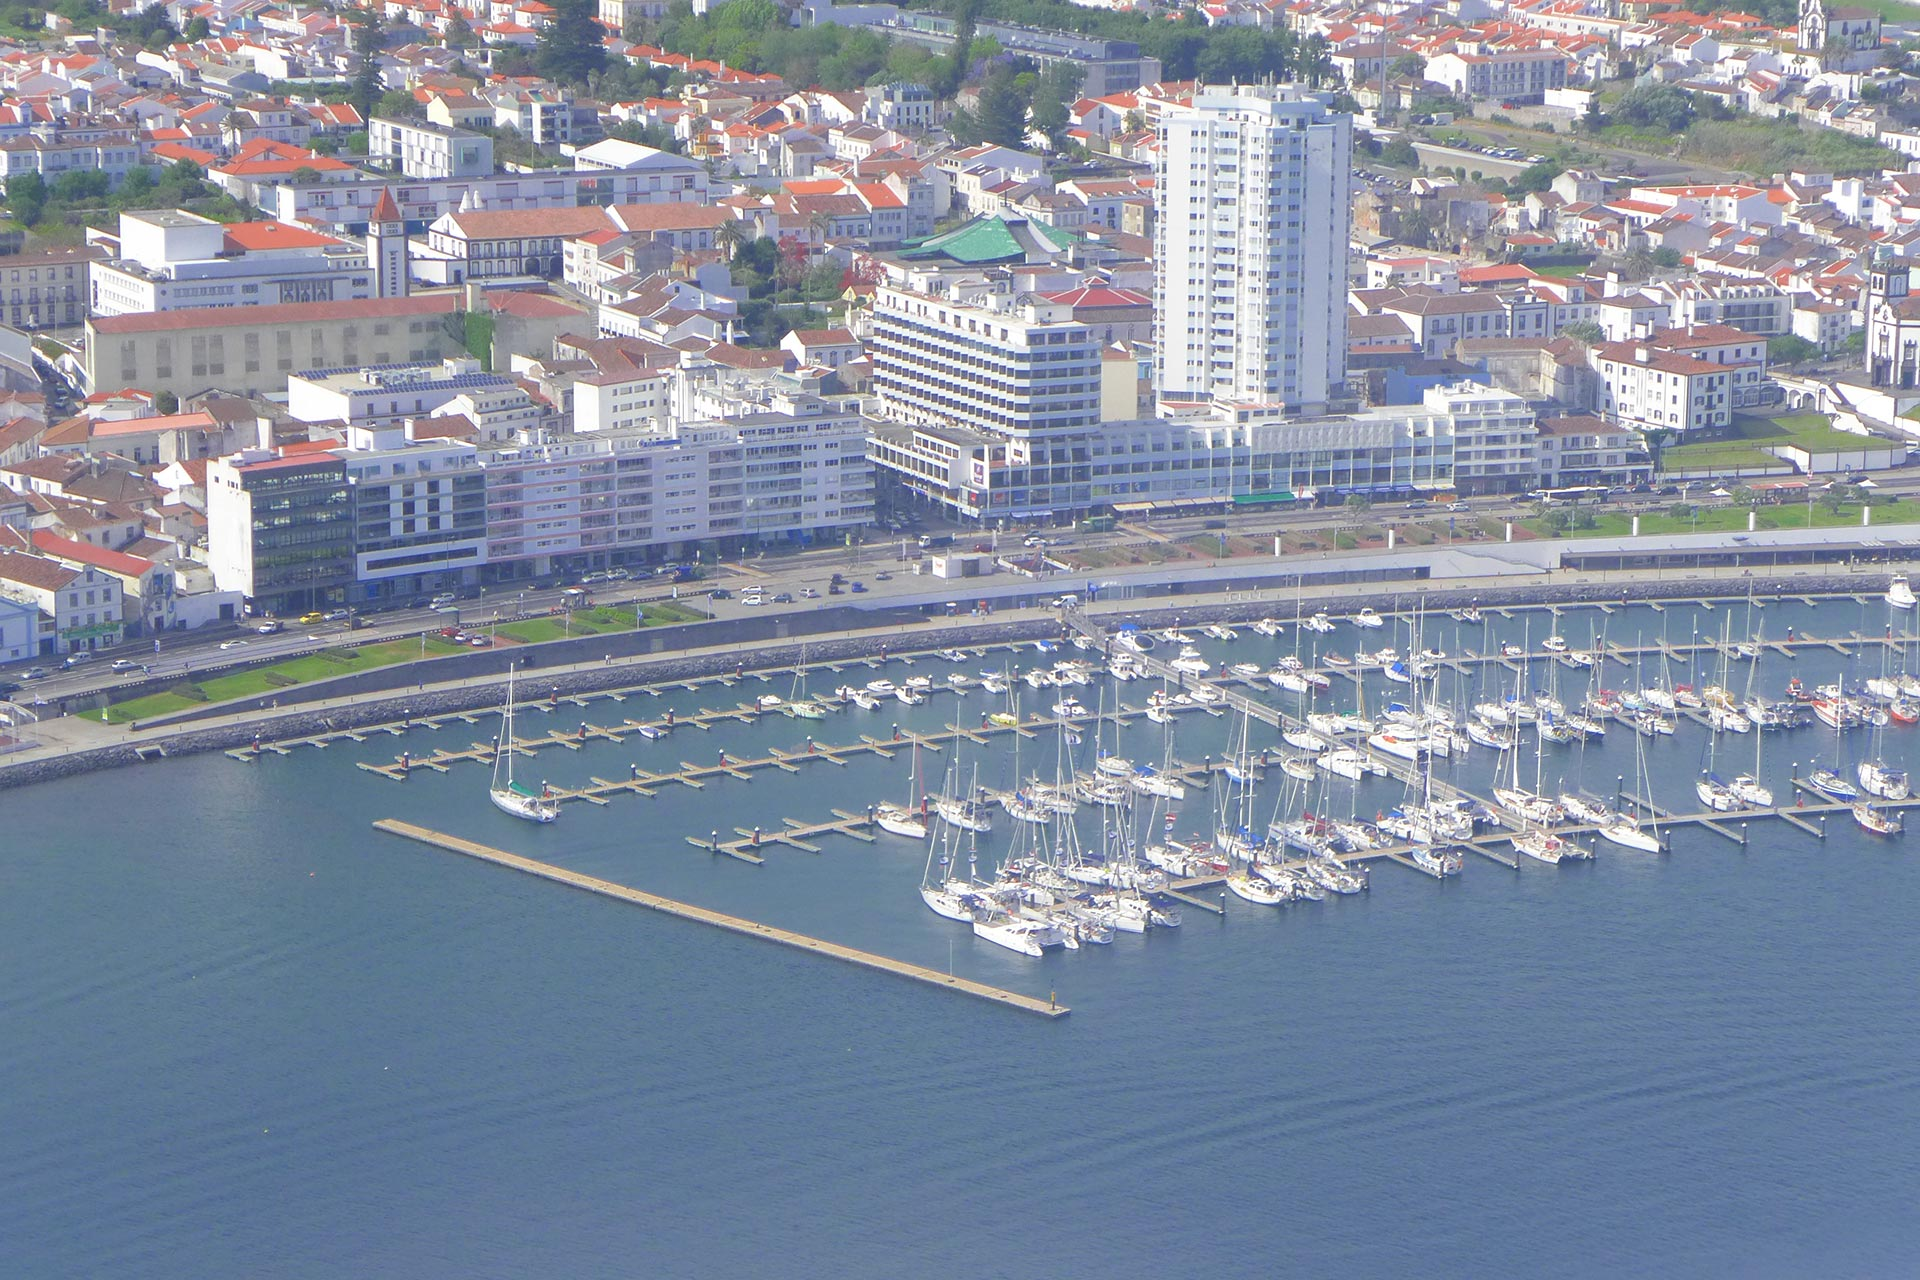 Luftbild vom Hafen Porta Delgada